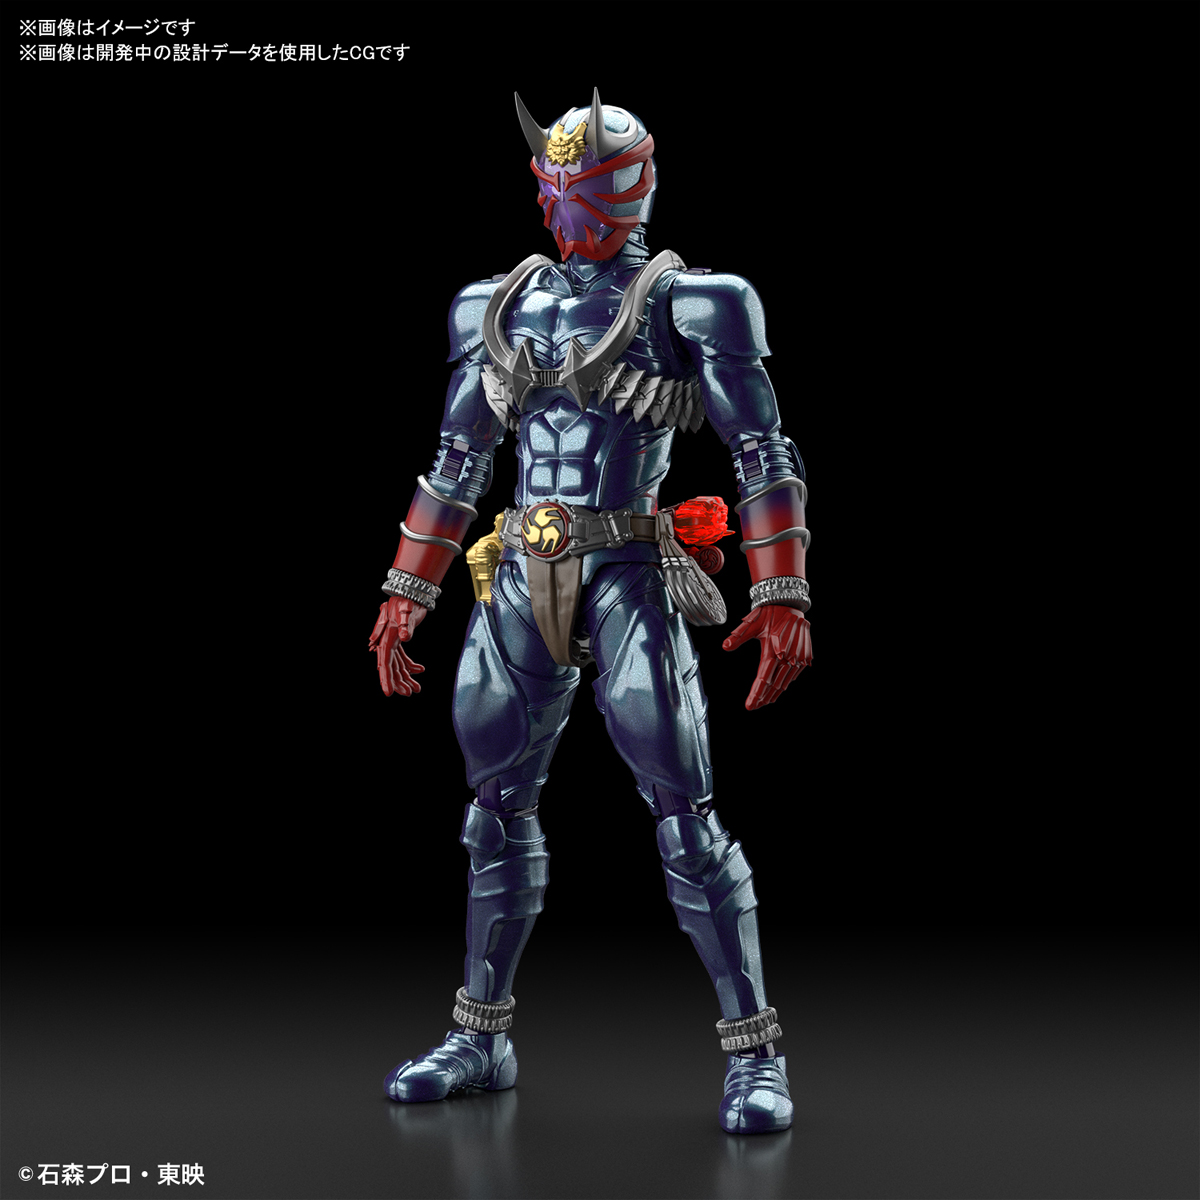 Figure-rise Standard『仮面ライダー響鬼』プラモデル-003